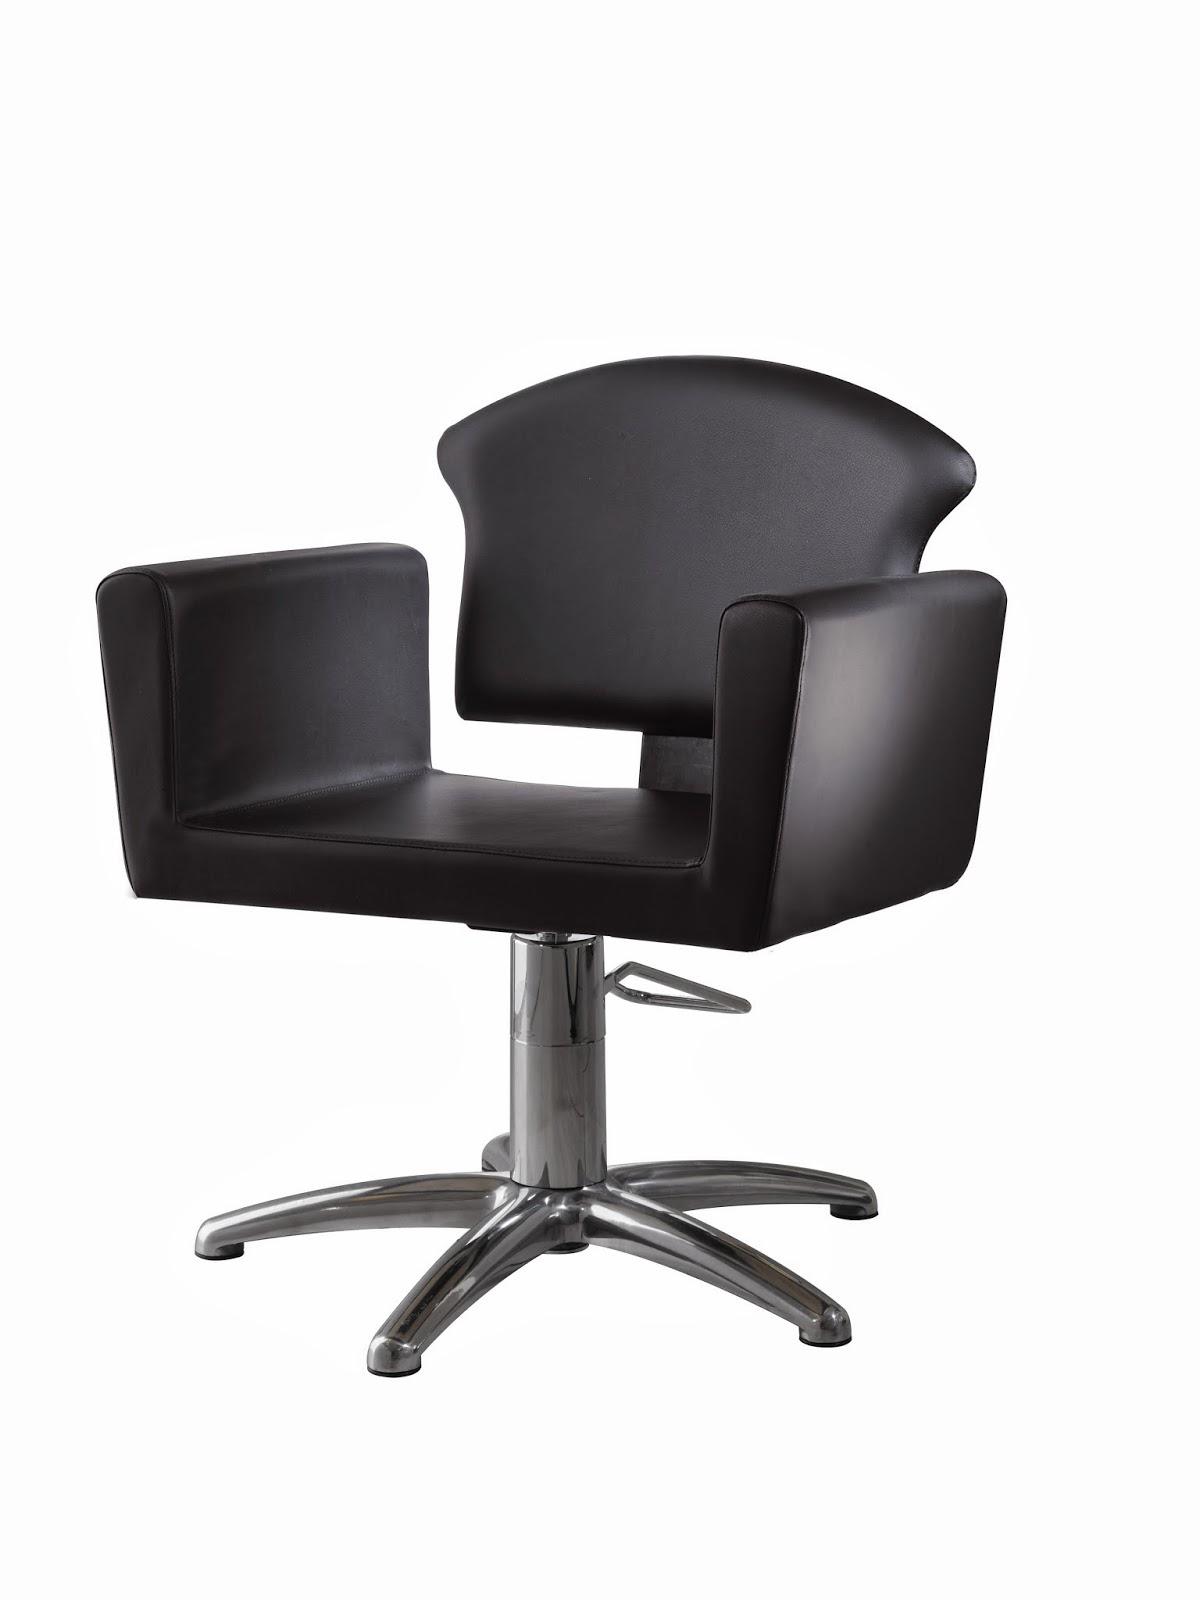 Salon furniture design london based salon furniture for Salon furniture design